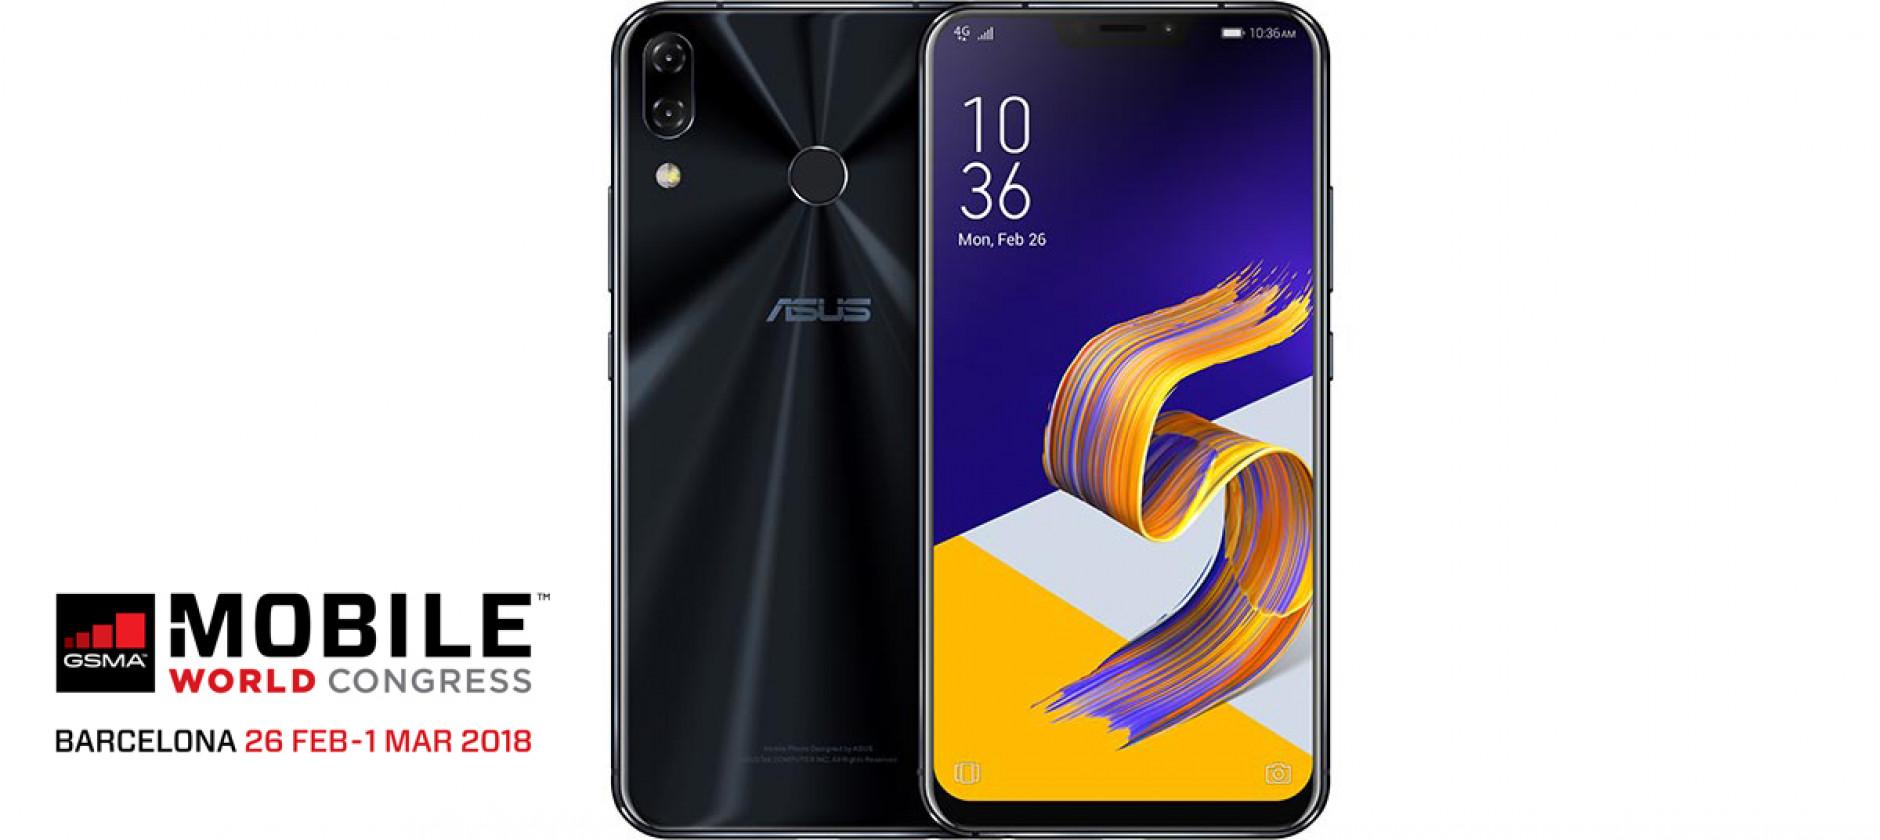 Asus Zenfone 5 MediaWorld